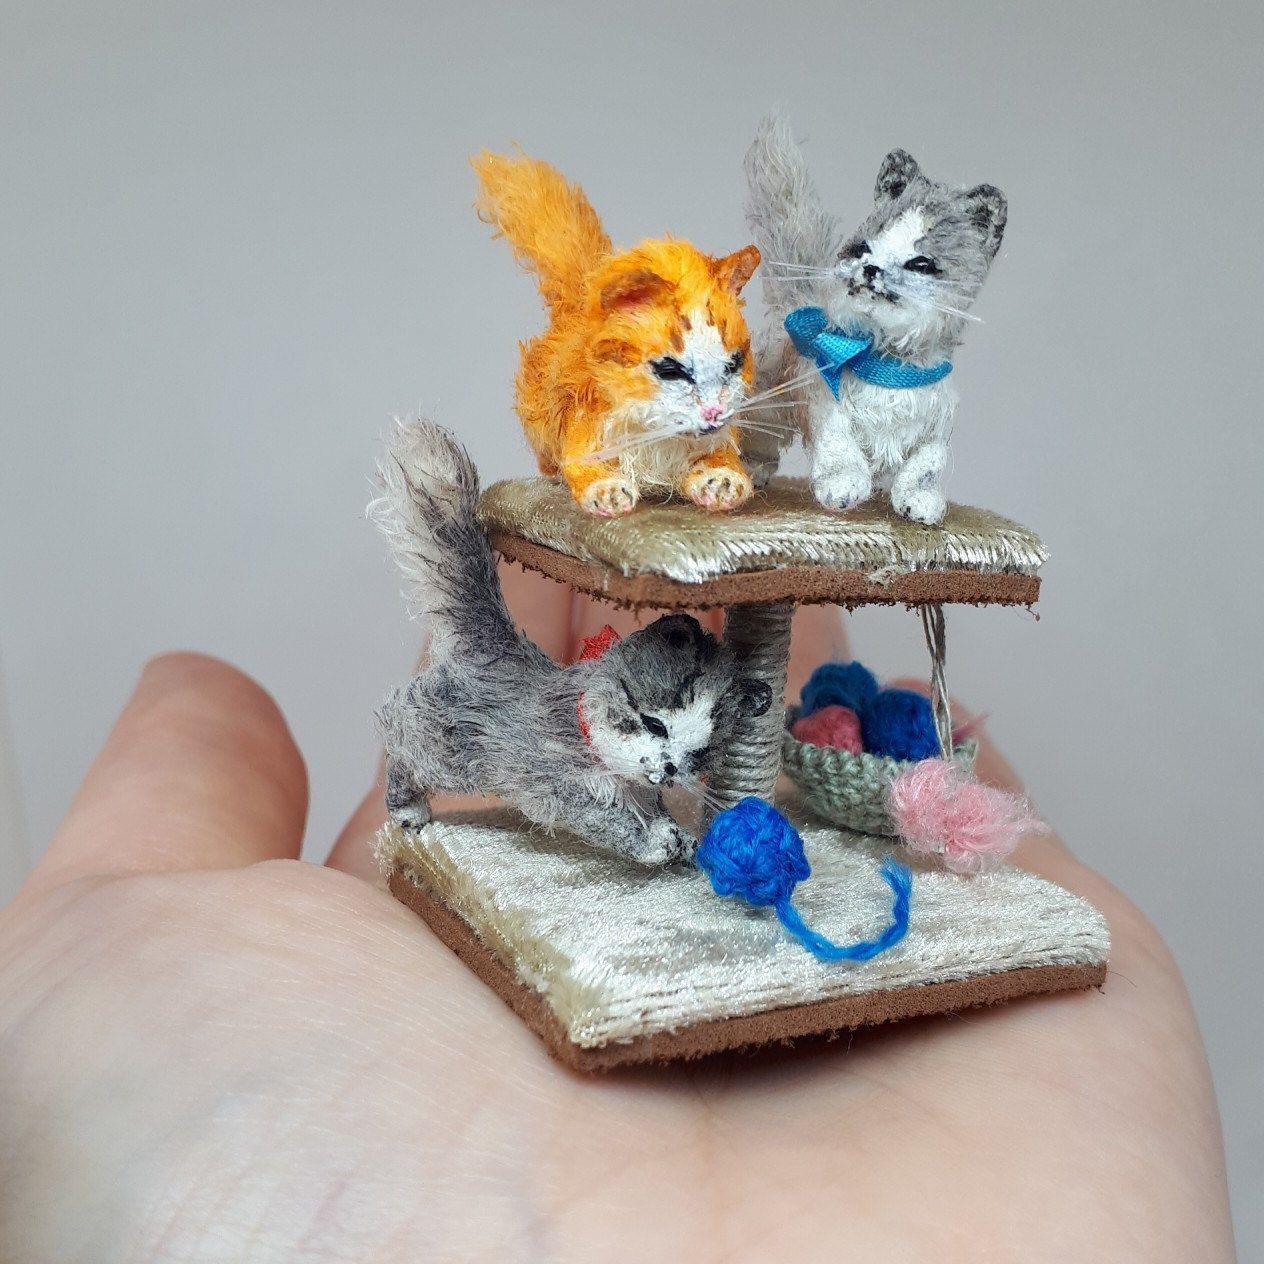 Miniature Realistic Cat Amigurumi Miniature Cat Miniature Etsy In 2020 Crochet Bear Crochet Teddy Tiny Cats